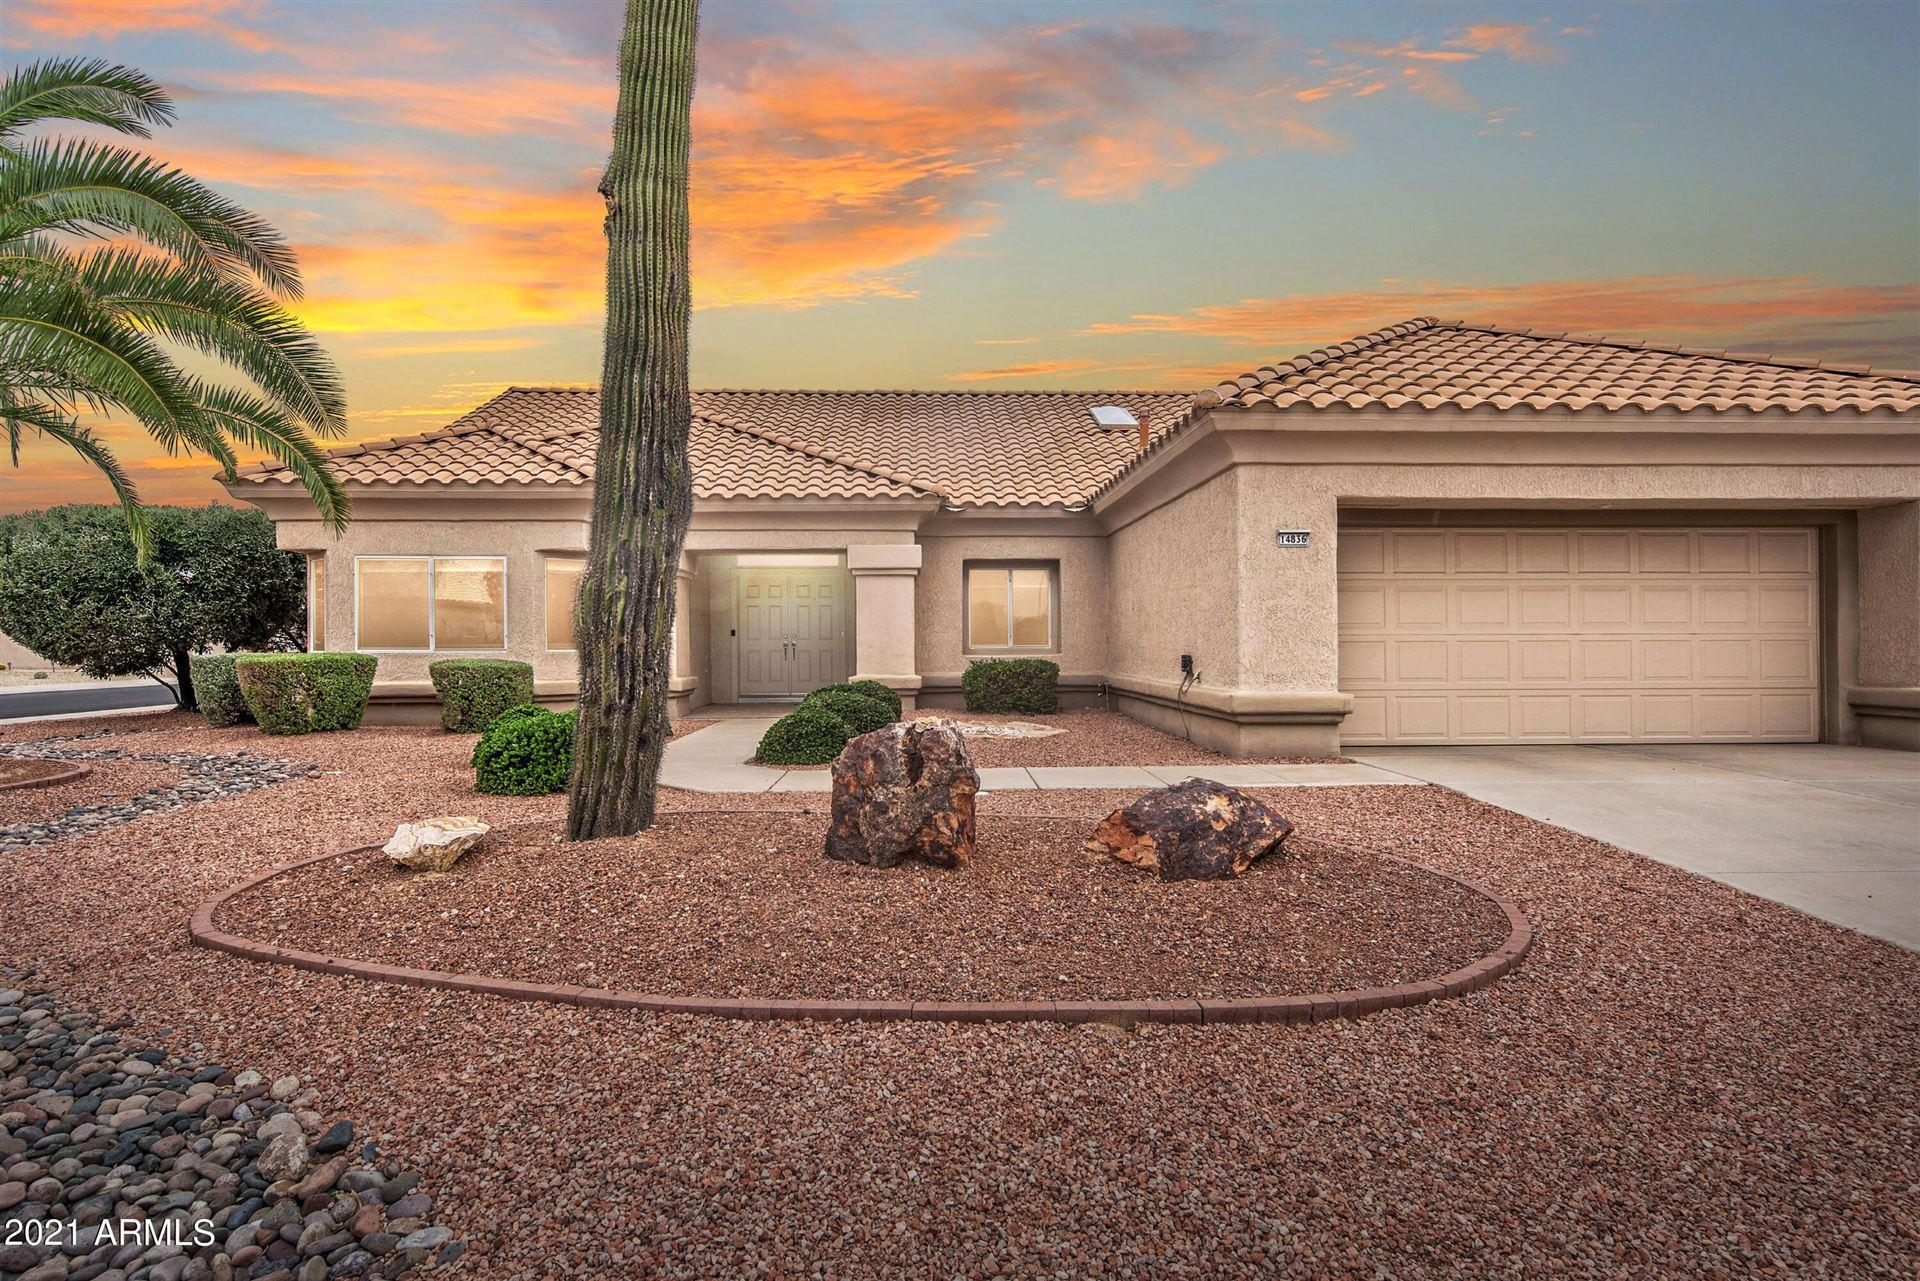 Photo of 14836 W HORSEMAN Lane, Sun City West, AZ 85375 (MLS # 6266199)